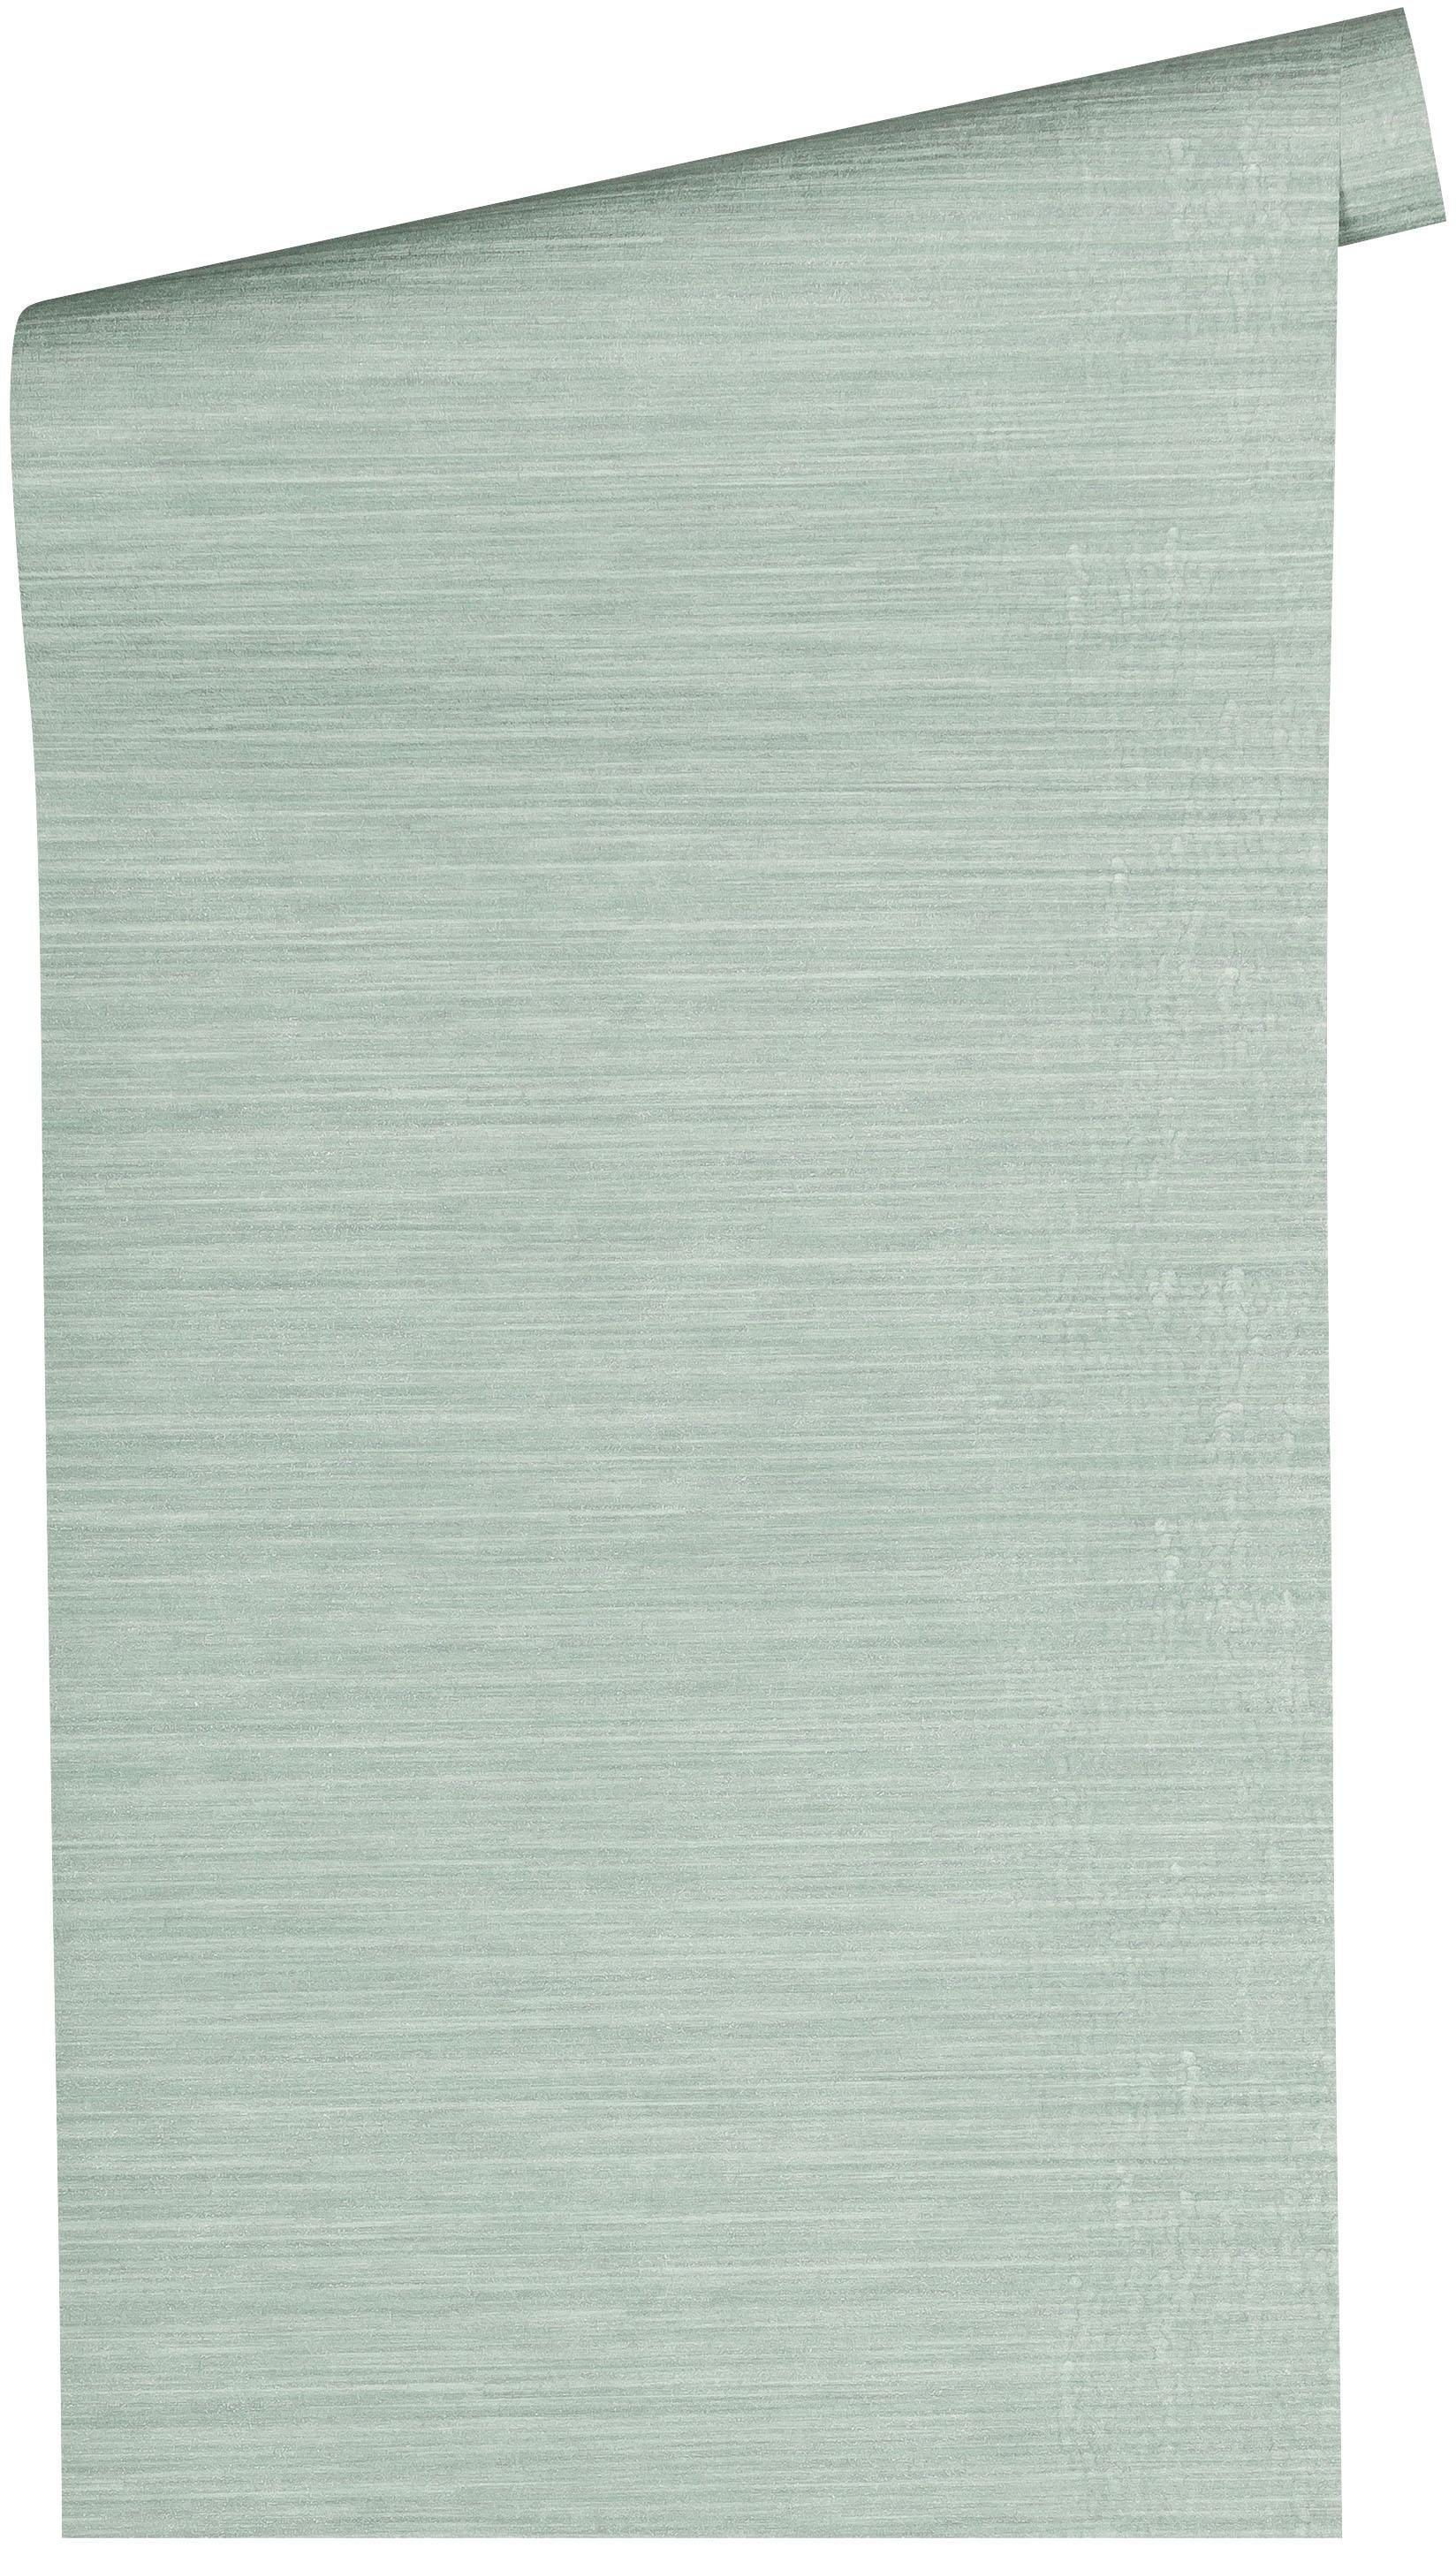 Vliestapete, living walls, »Tapete Titanium 2« | Baumarkt | Matt - Muster - Beige - Weiß - Schwarz | living walls